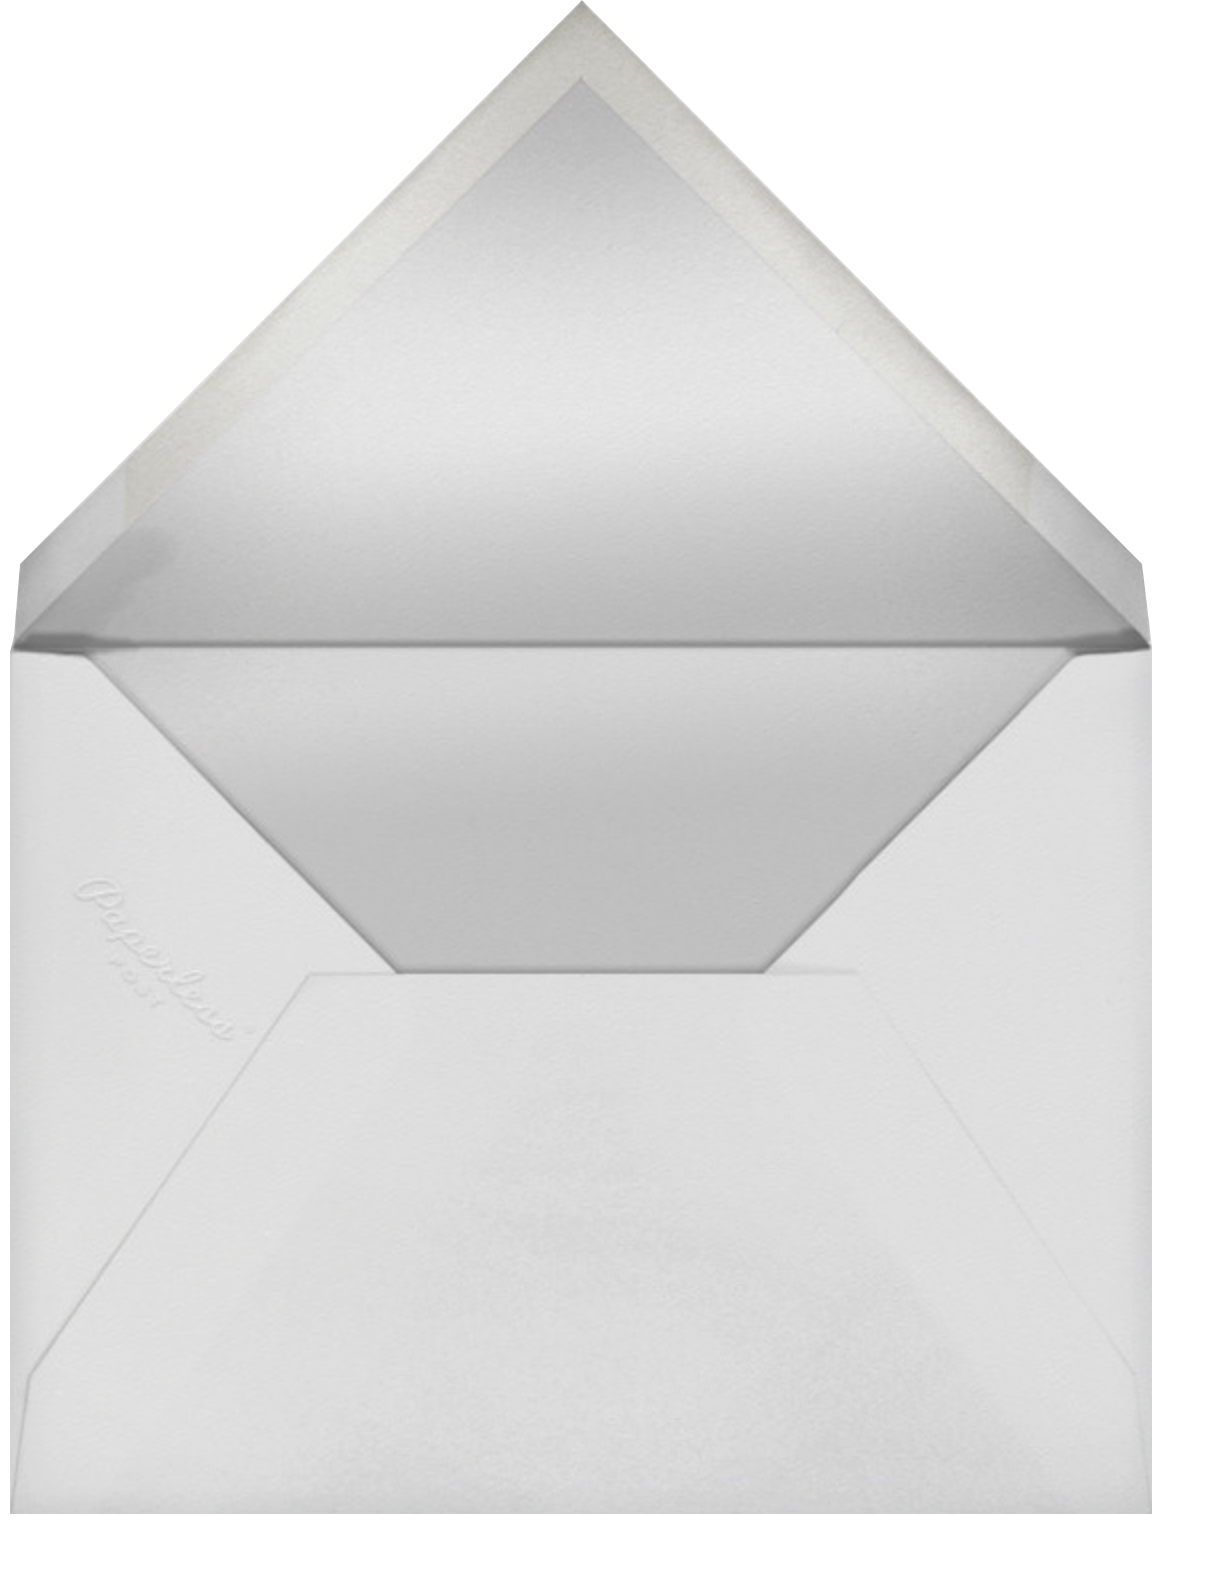 Big Heart - Paperless Post - Valentine's Day - envelope back